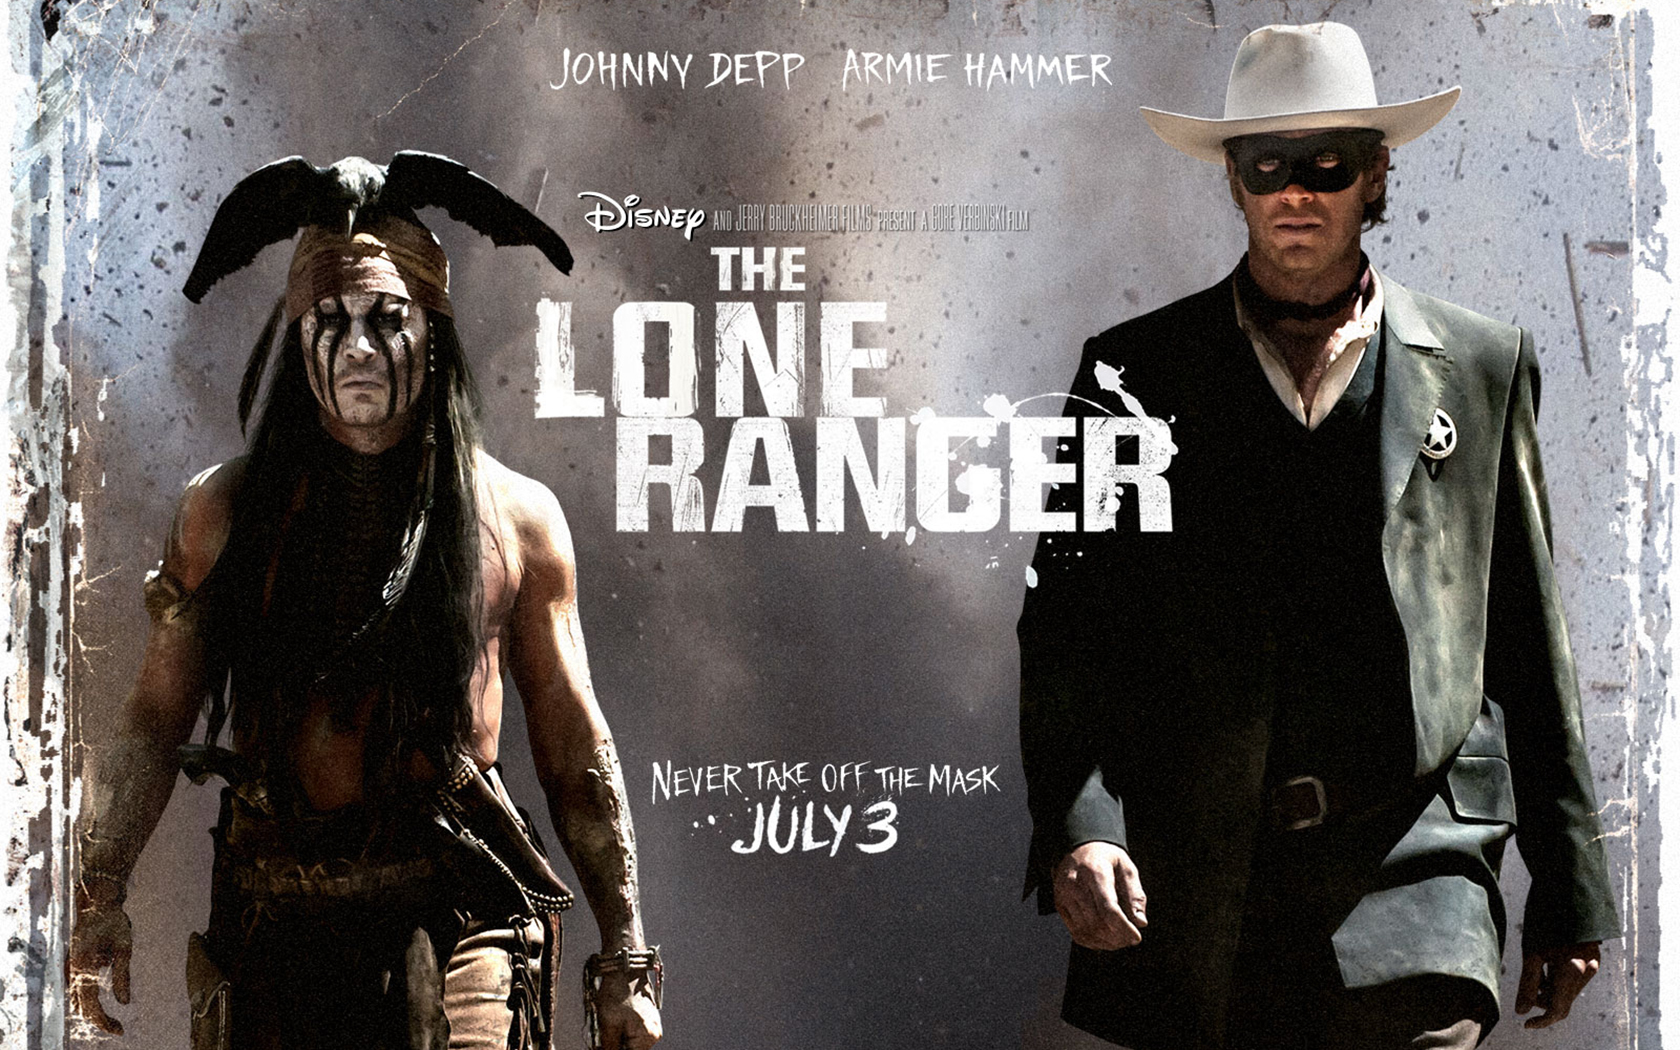 High Resolution Wallpaper | The Lone Ranger 1680x1050 px